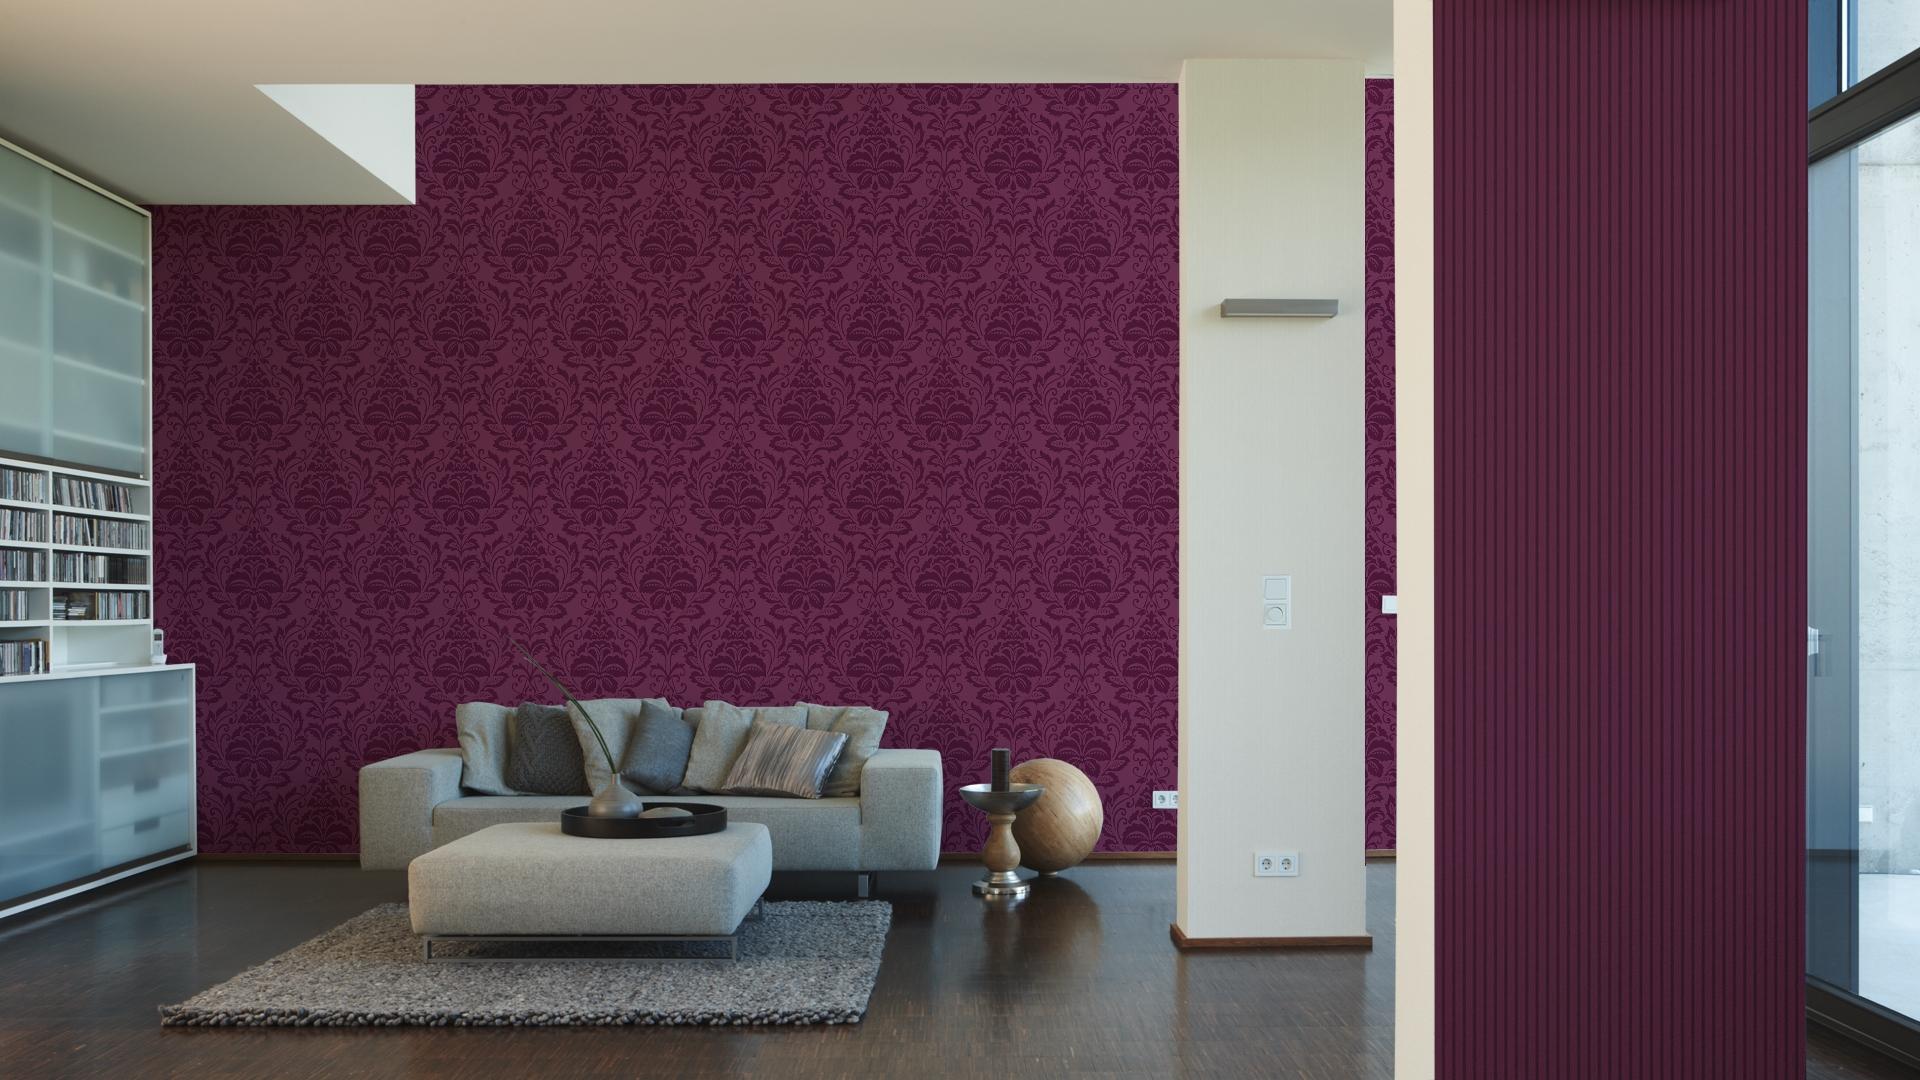 Livingwalls Vliestapete Flock 3, neo-barock, violett